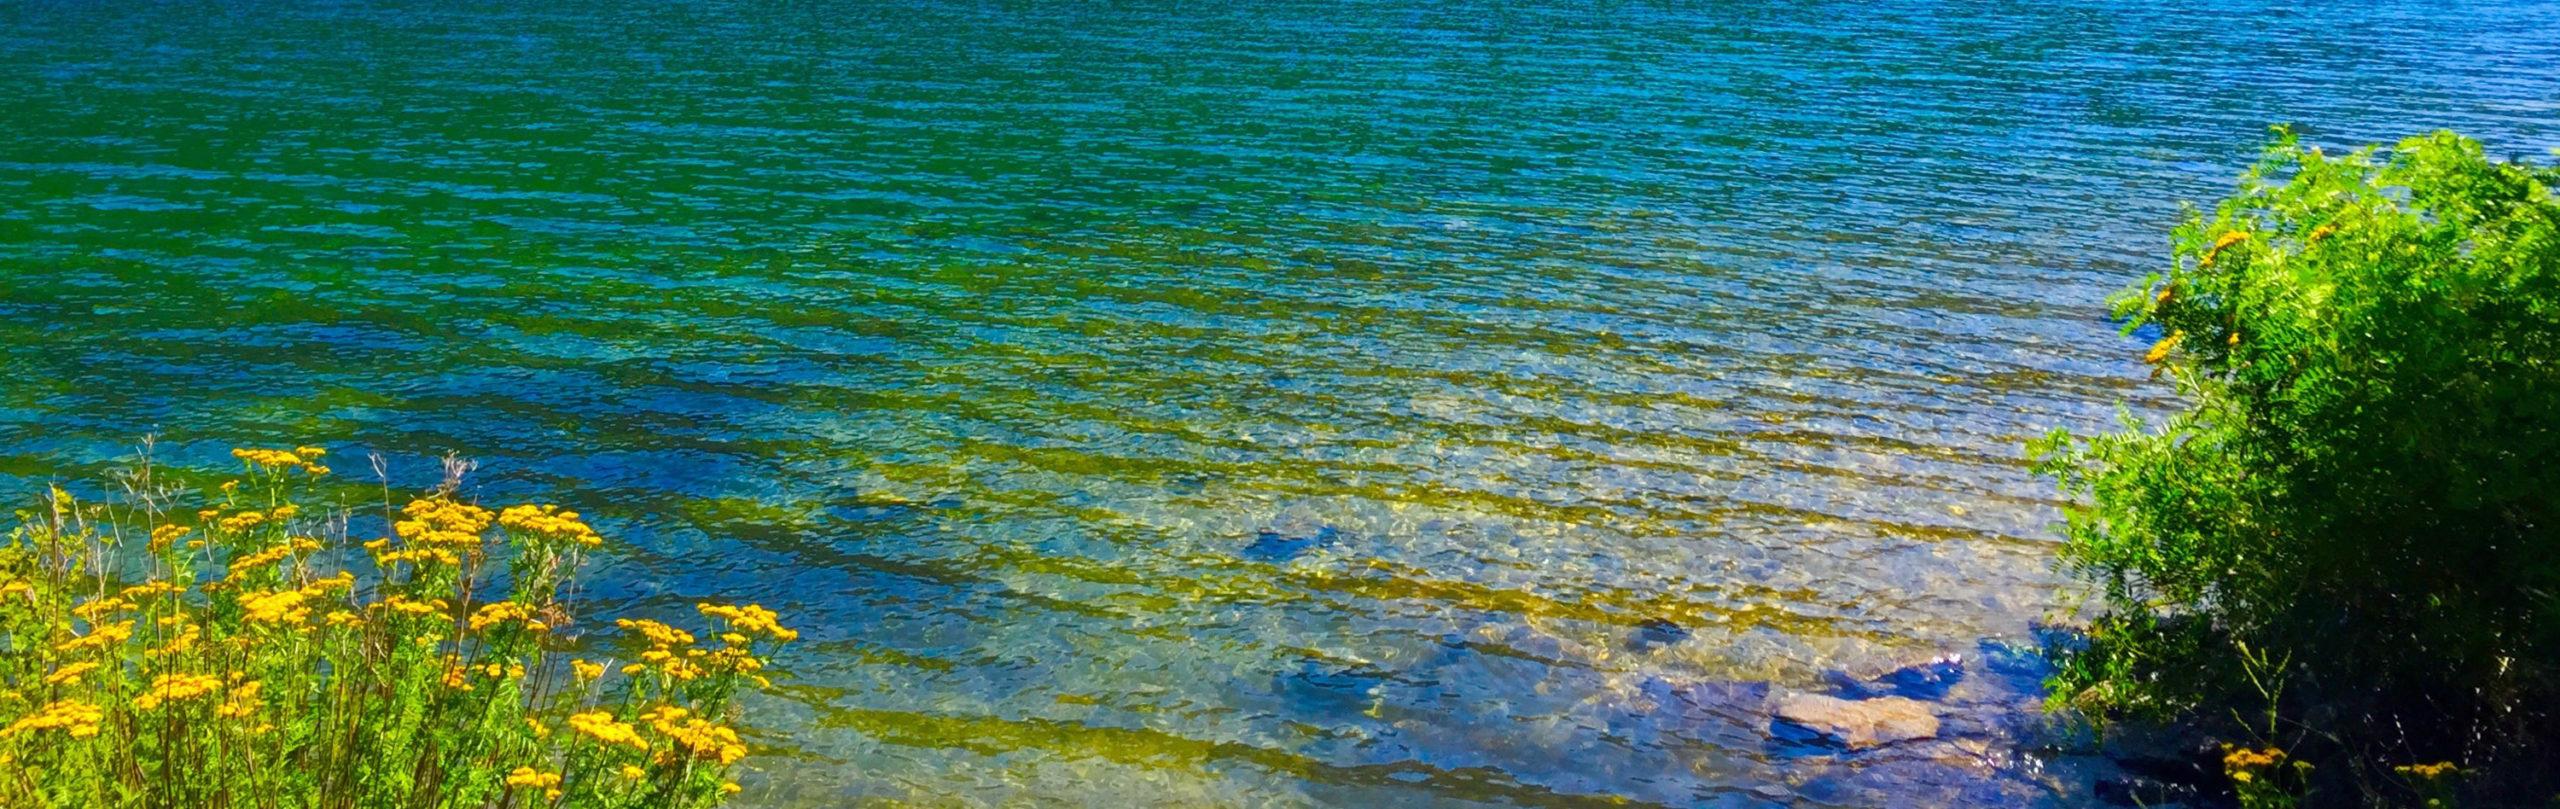 lake pend orielle near sandpoint idaho